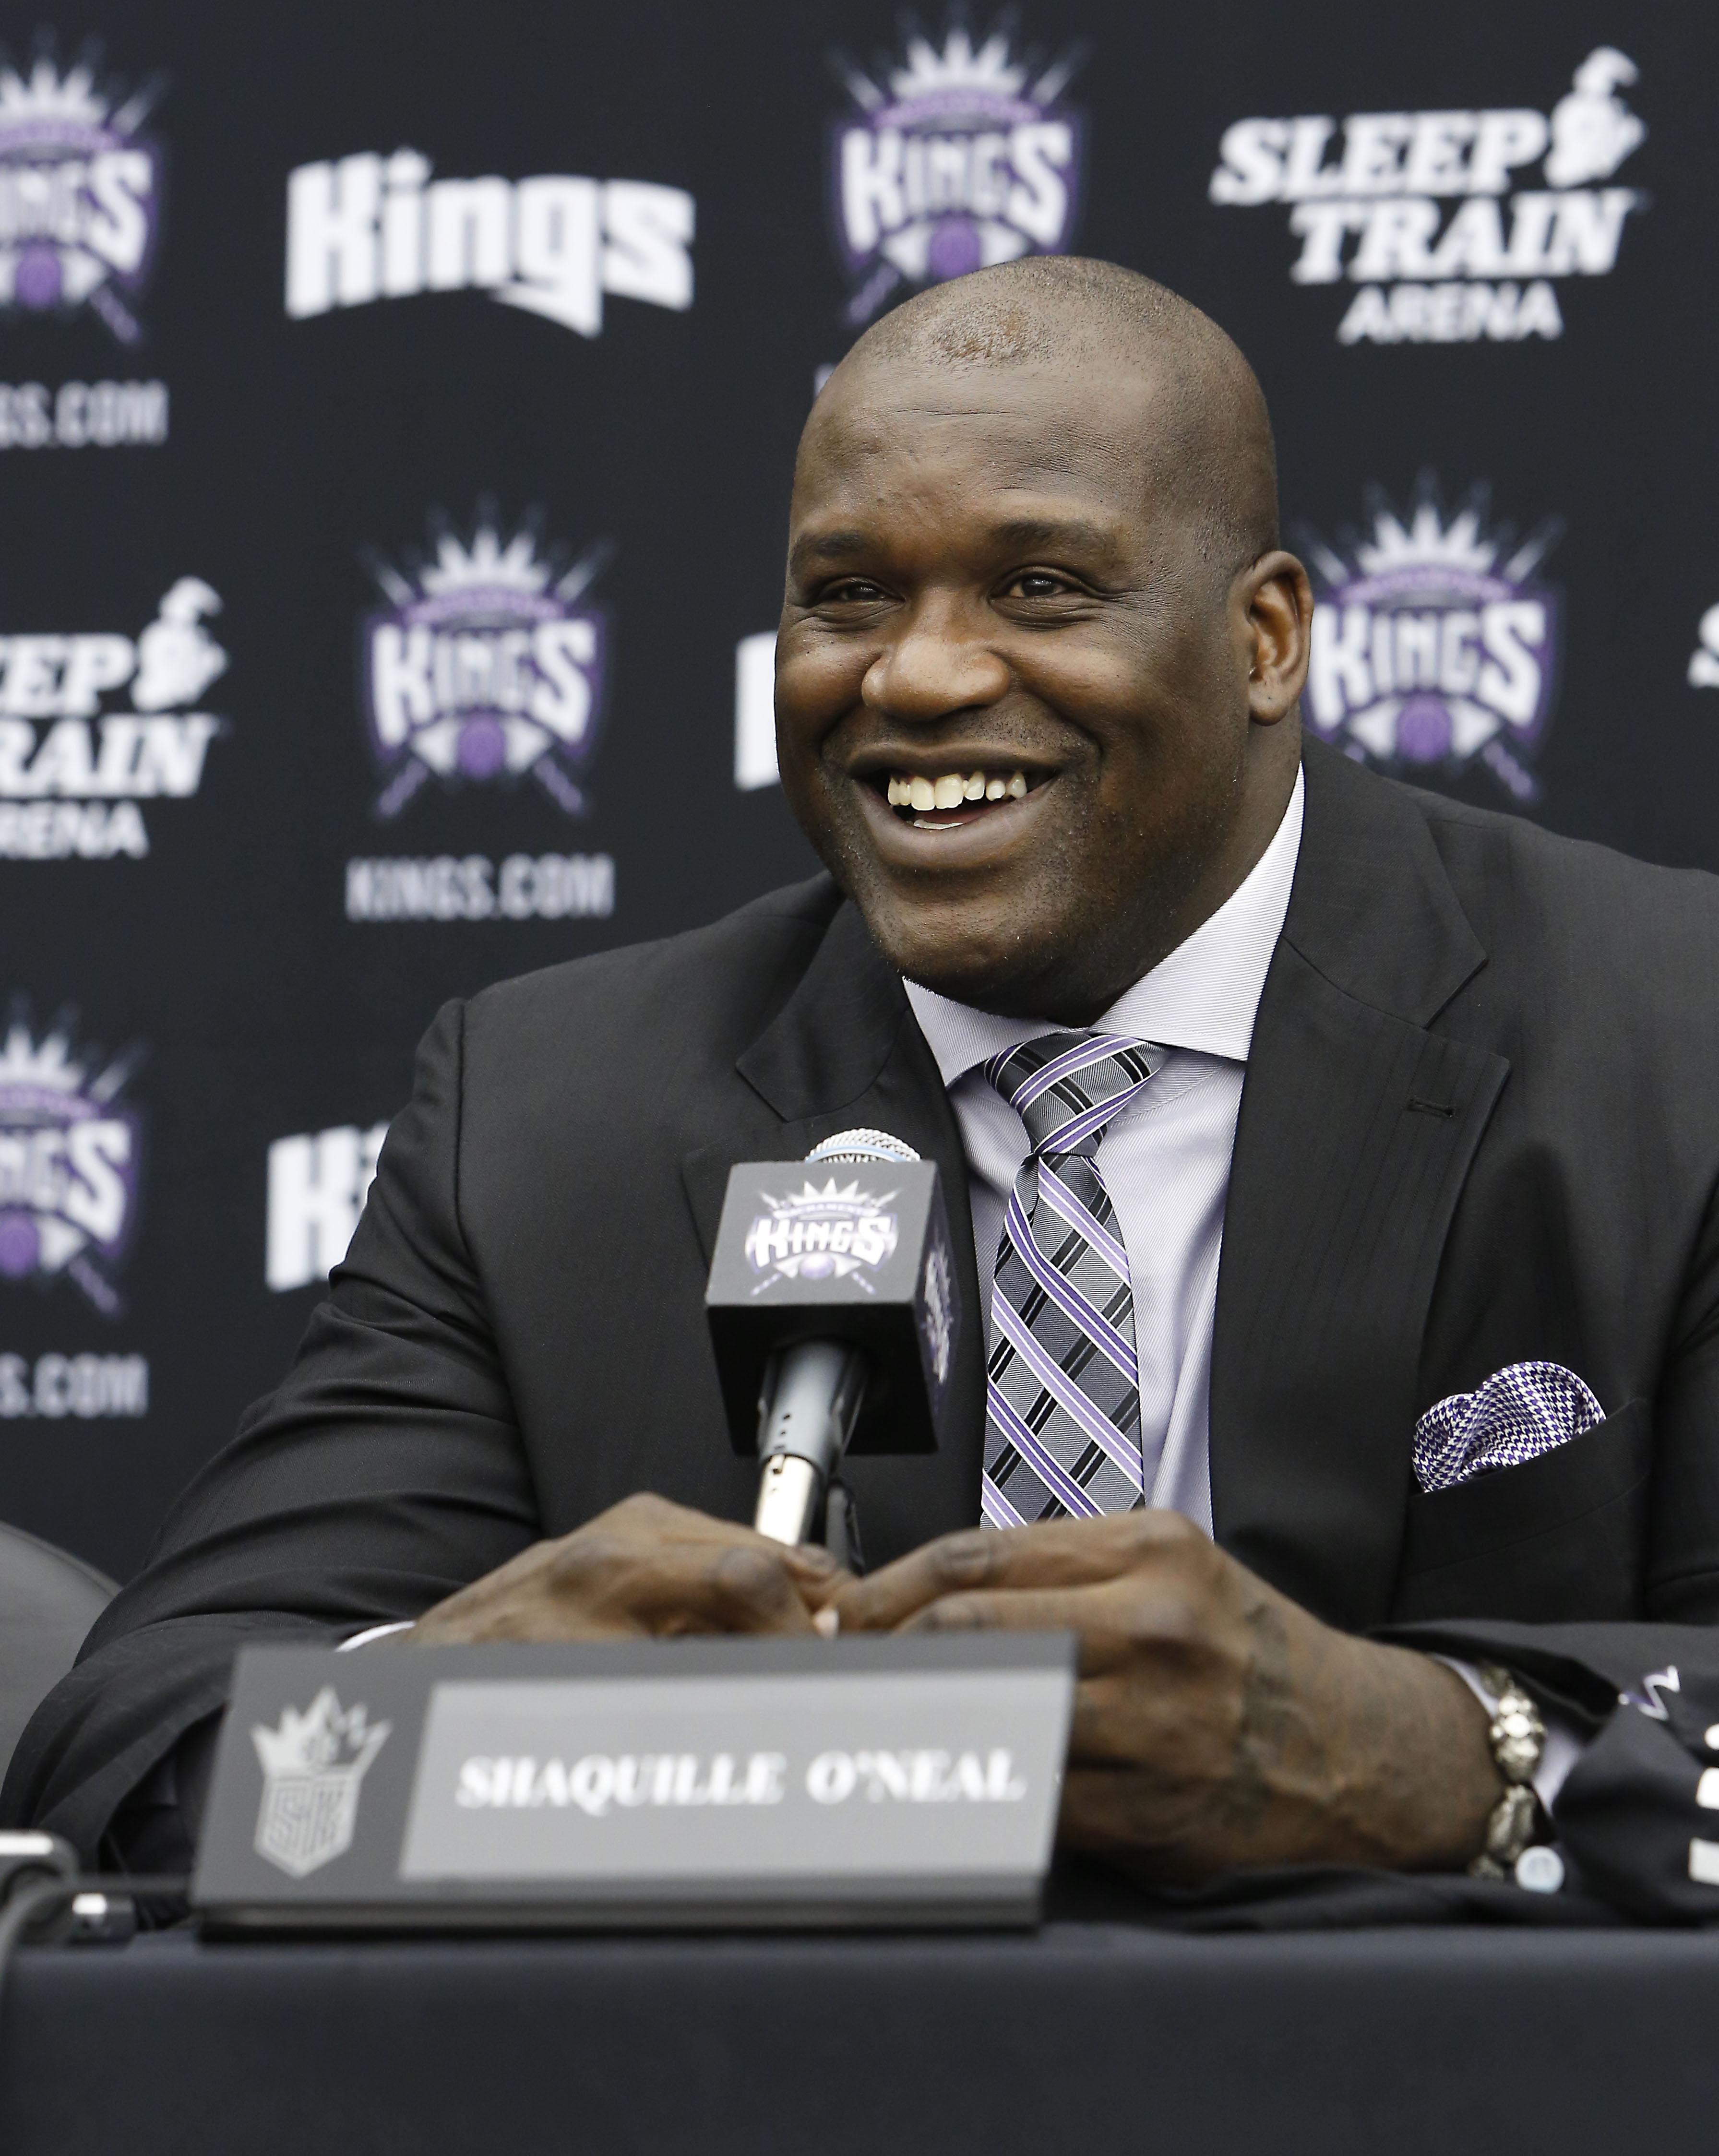 Shaq shows Sacramento love as Kings minority owner